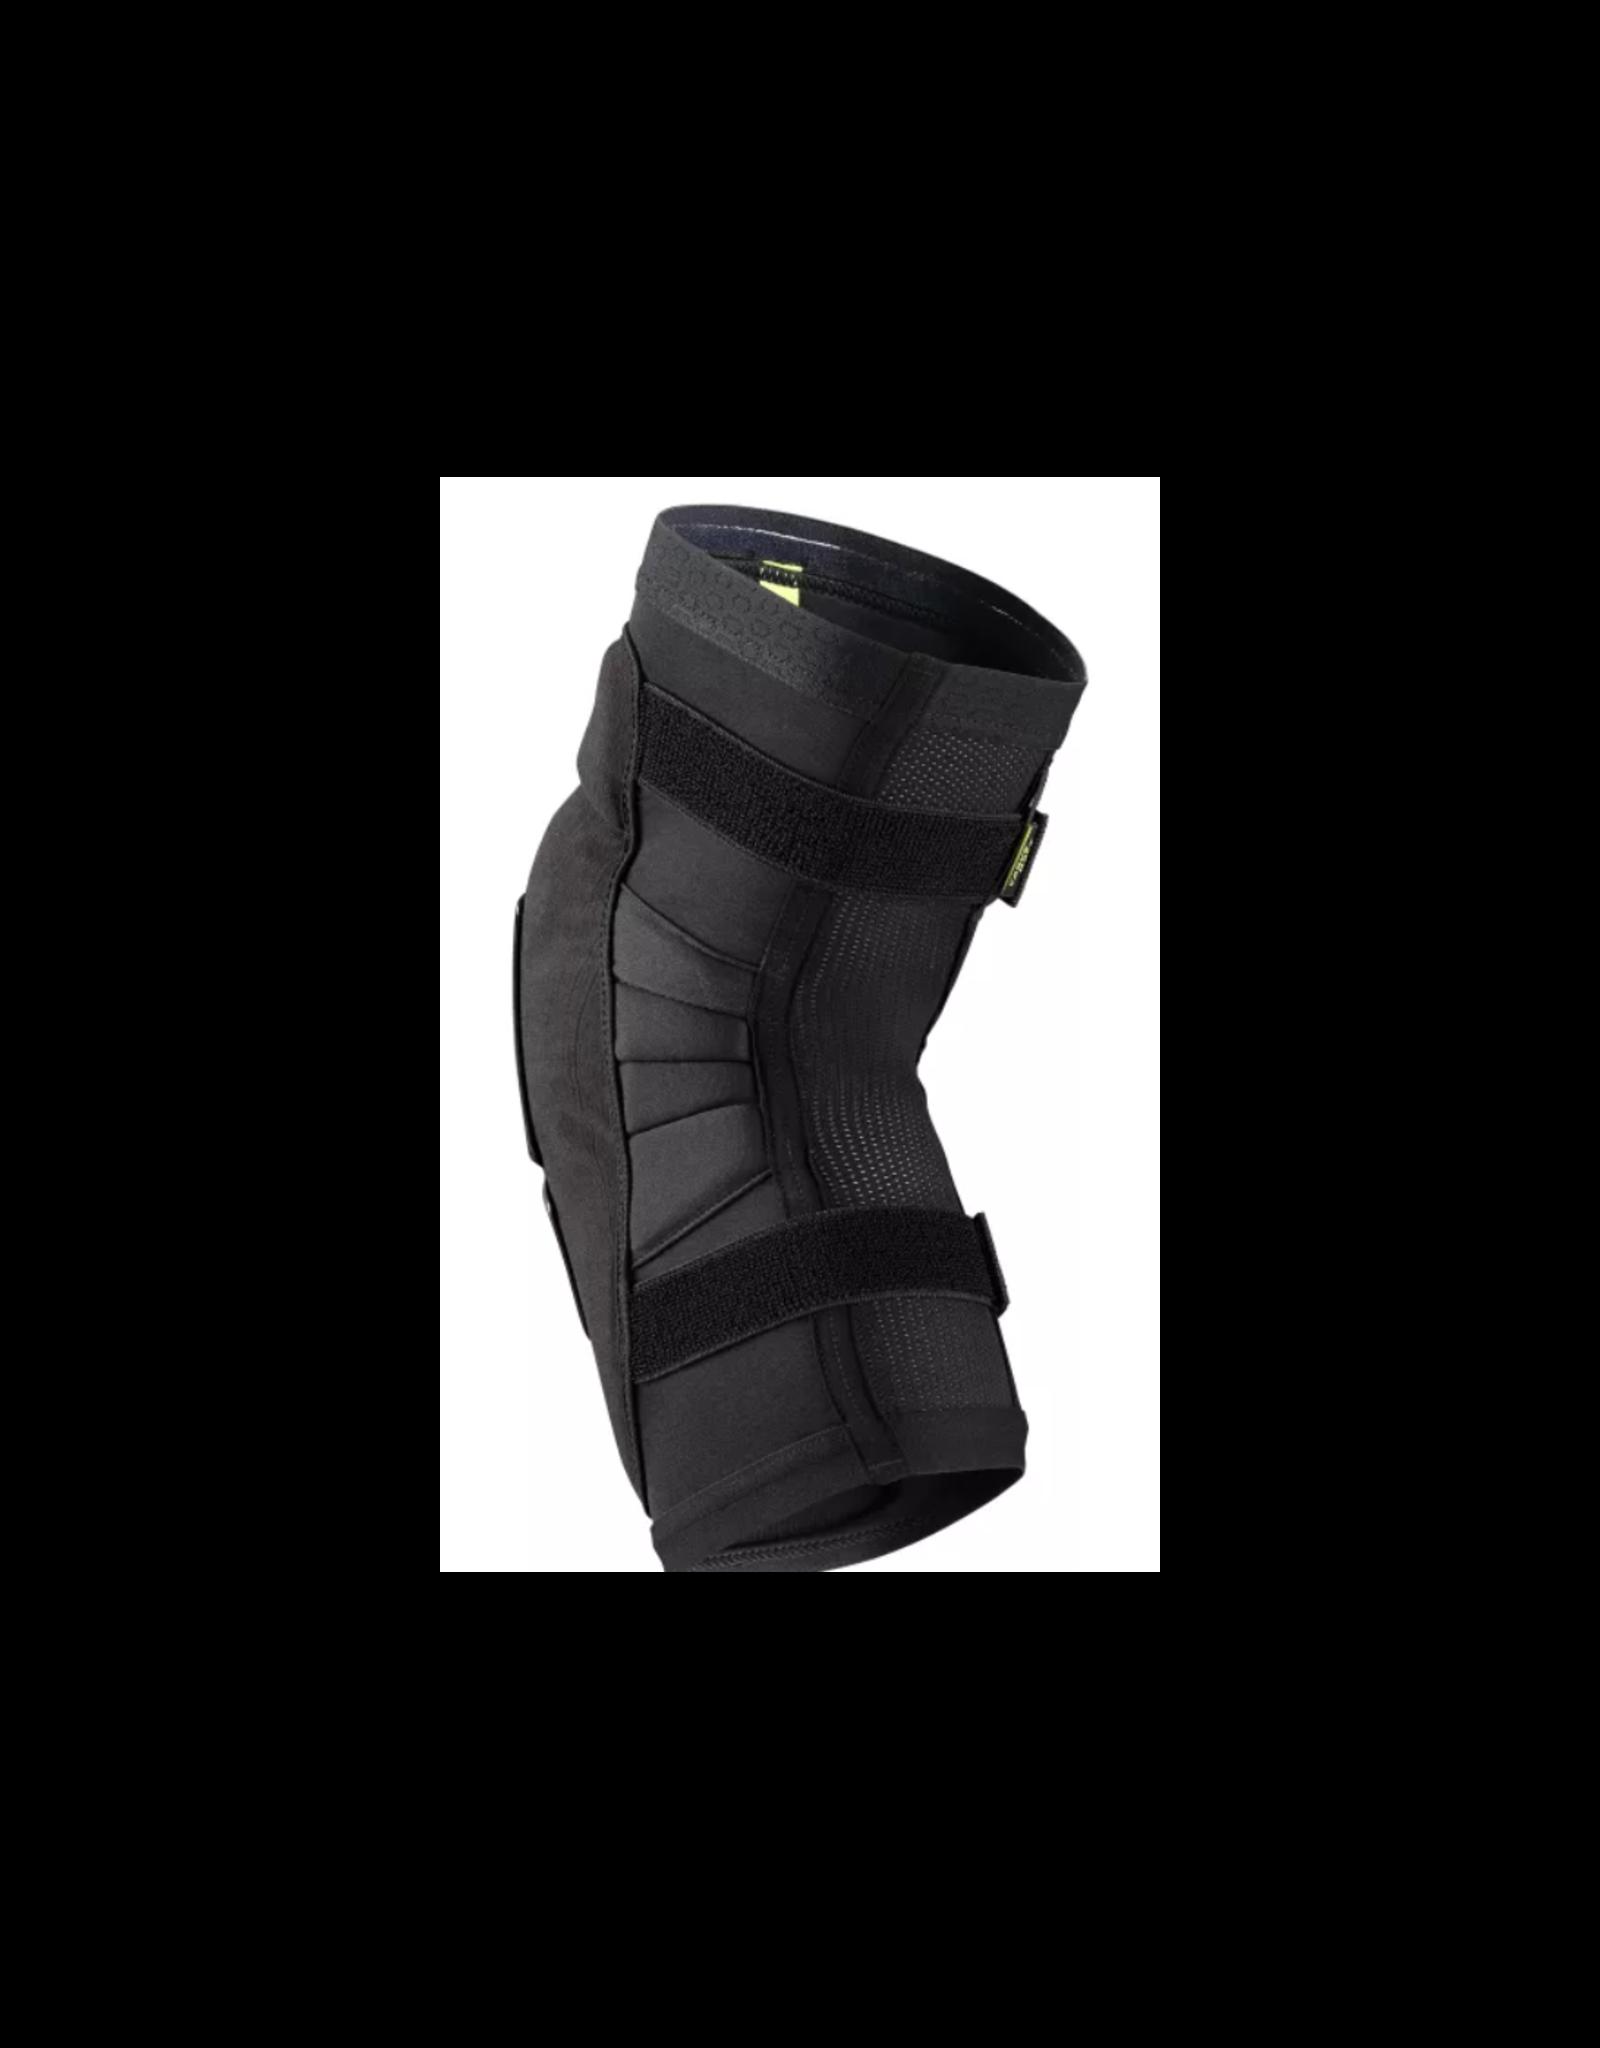 IXS IXS - Carve Race Knee Pad BLK L